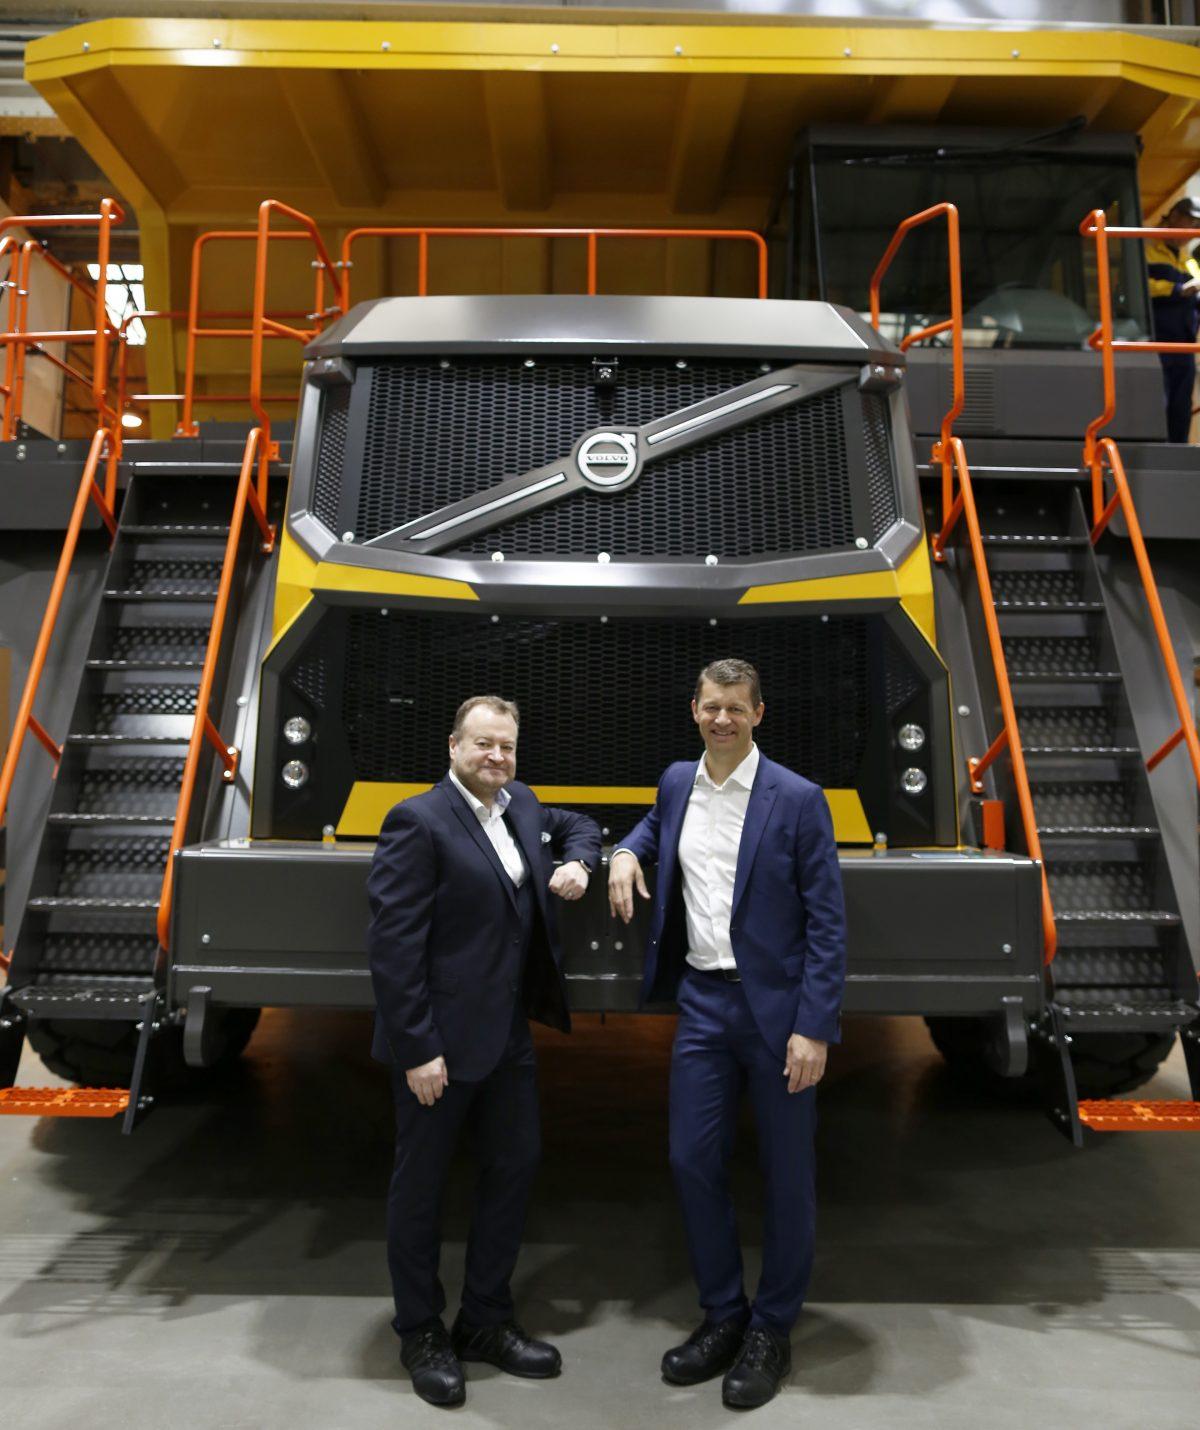 Volvo CE President Melker Jernberg (right) with Volvo CE Vice President of Rigid Haulers Paul Douglas